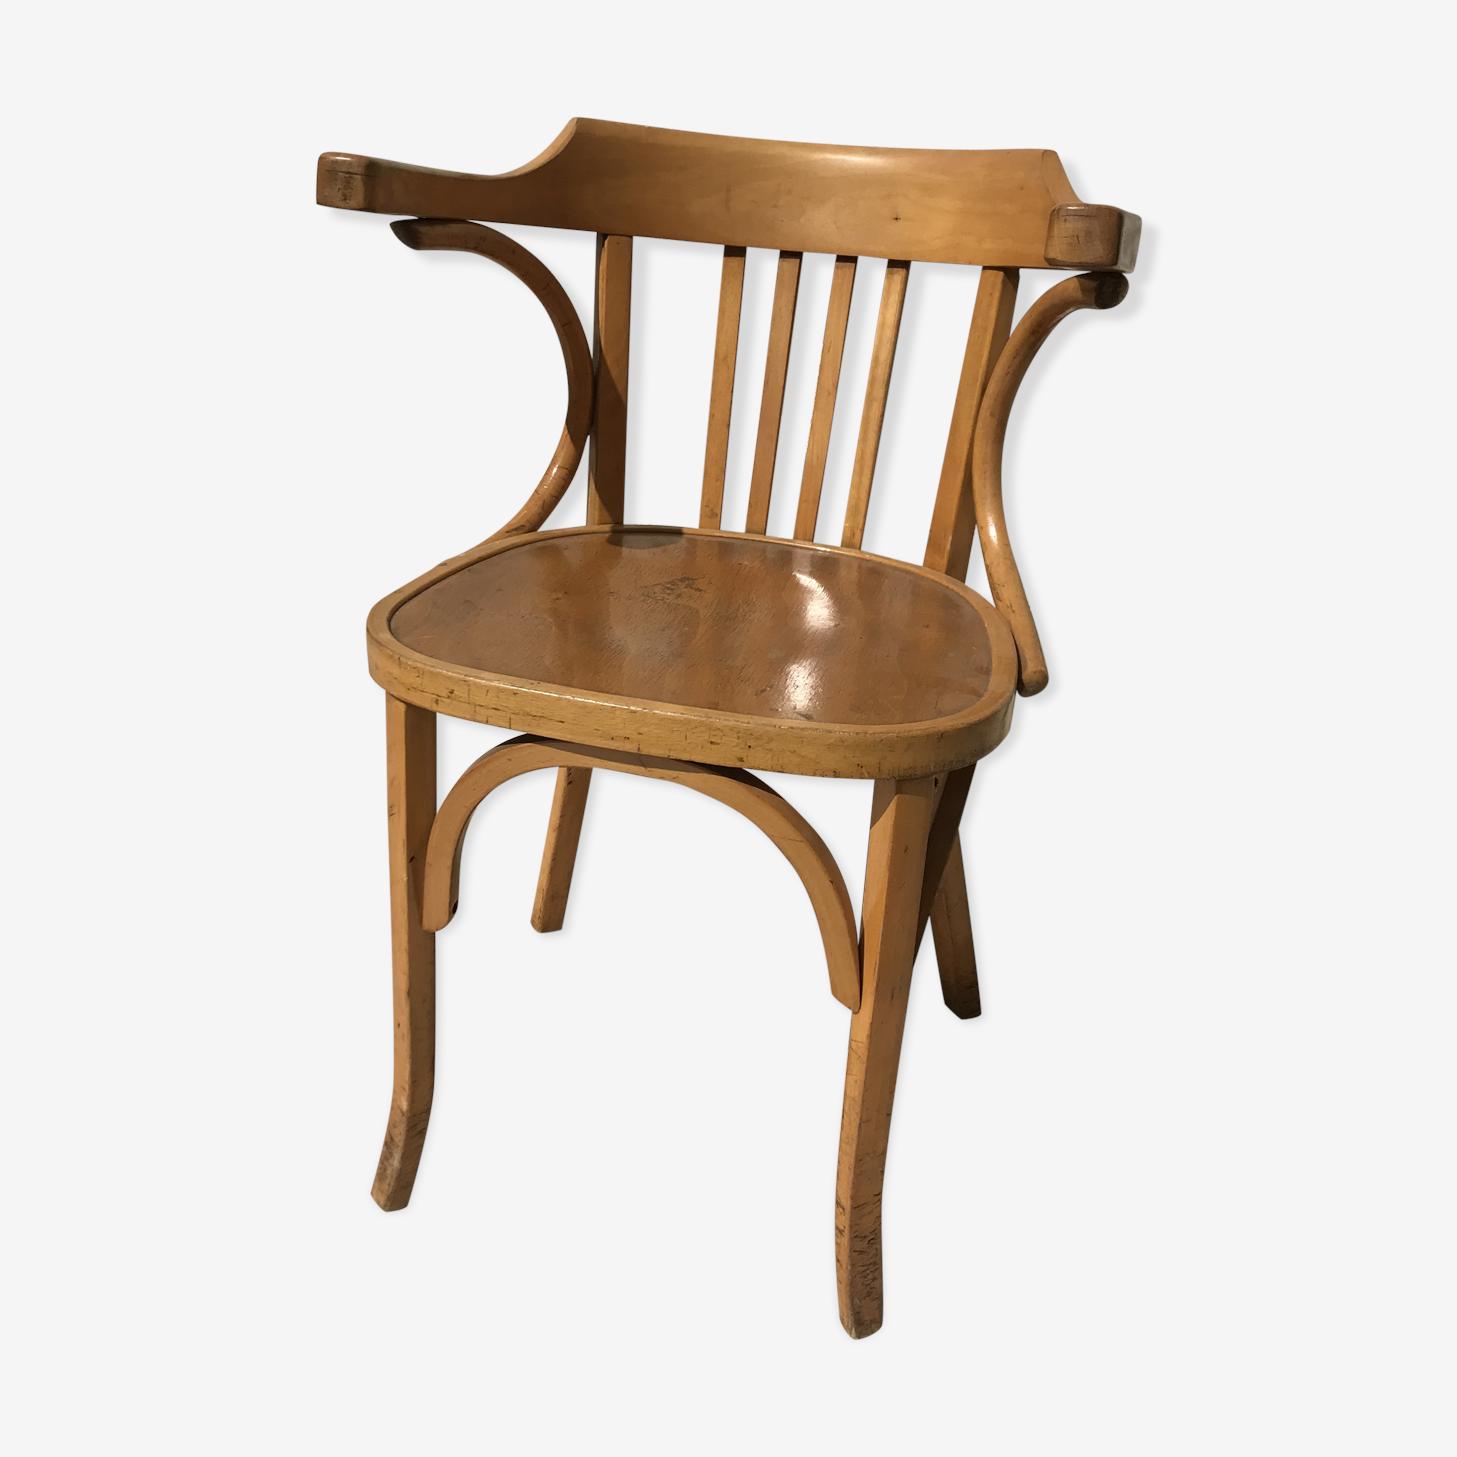 Baumann armchair